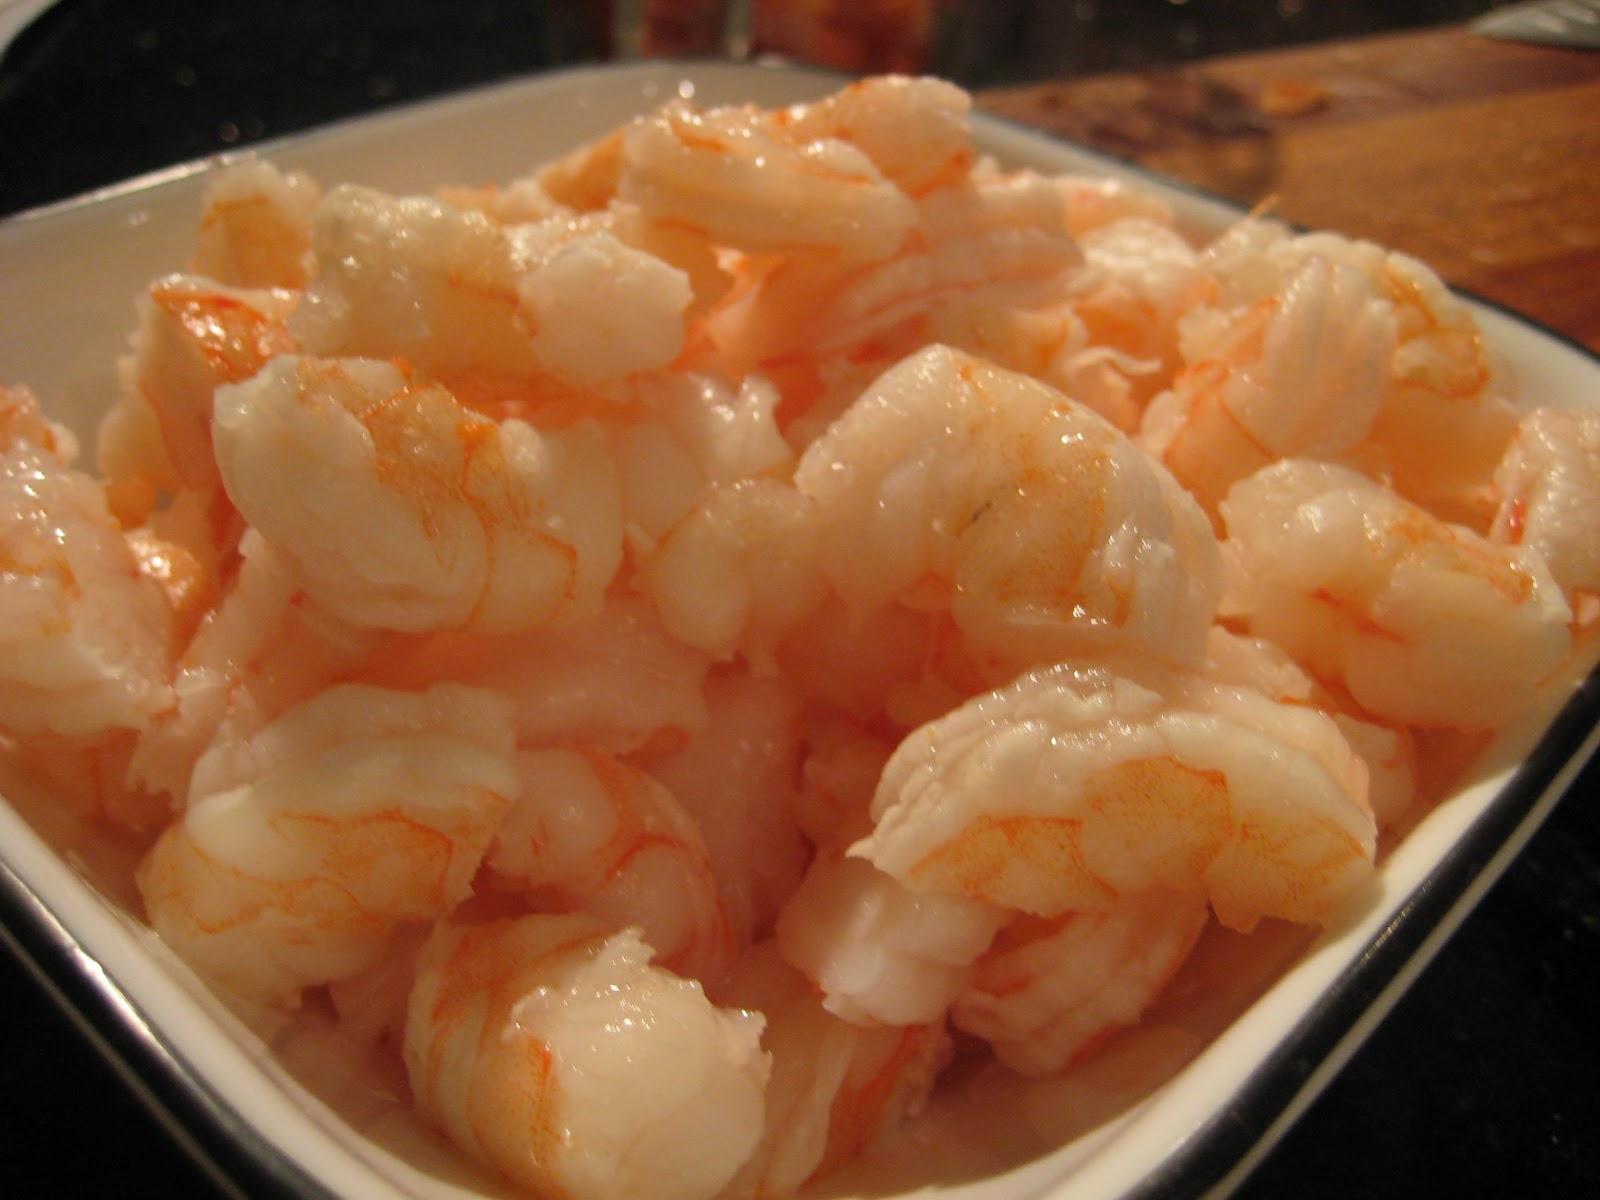 Belle's Baking: Sauteed Cajun Shrimp